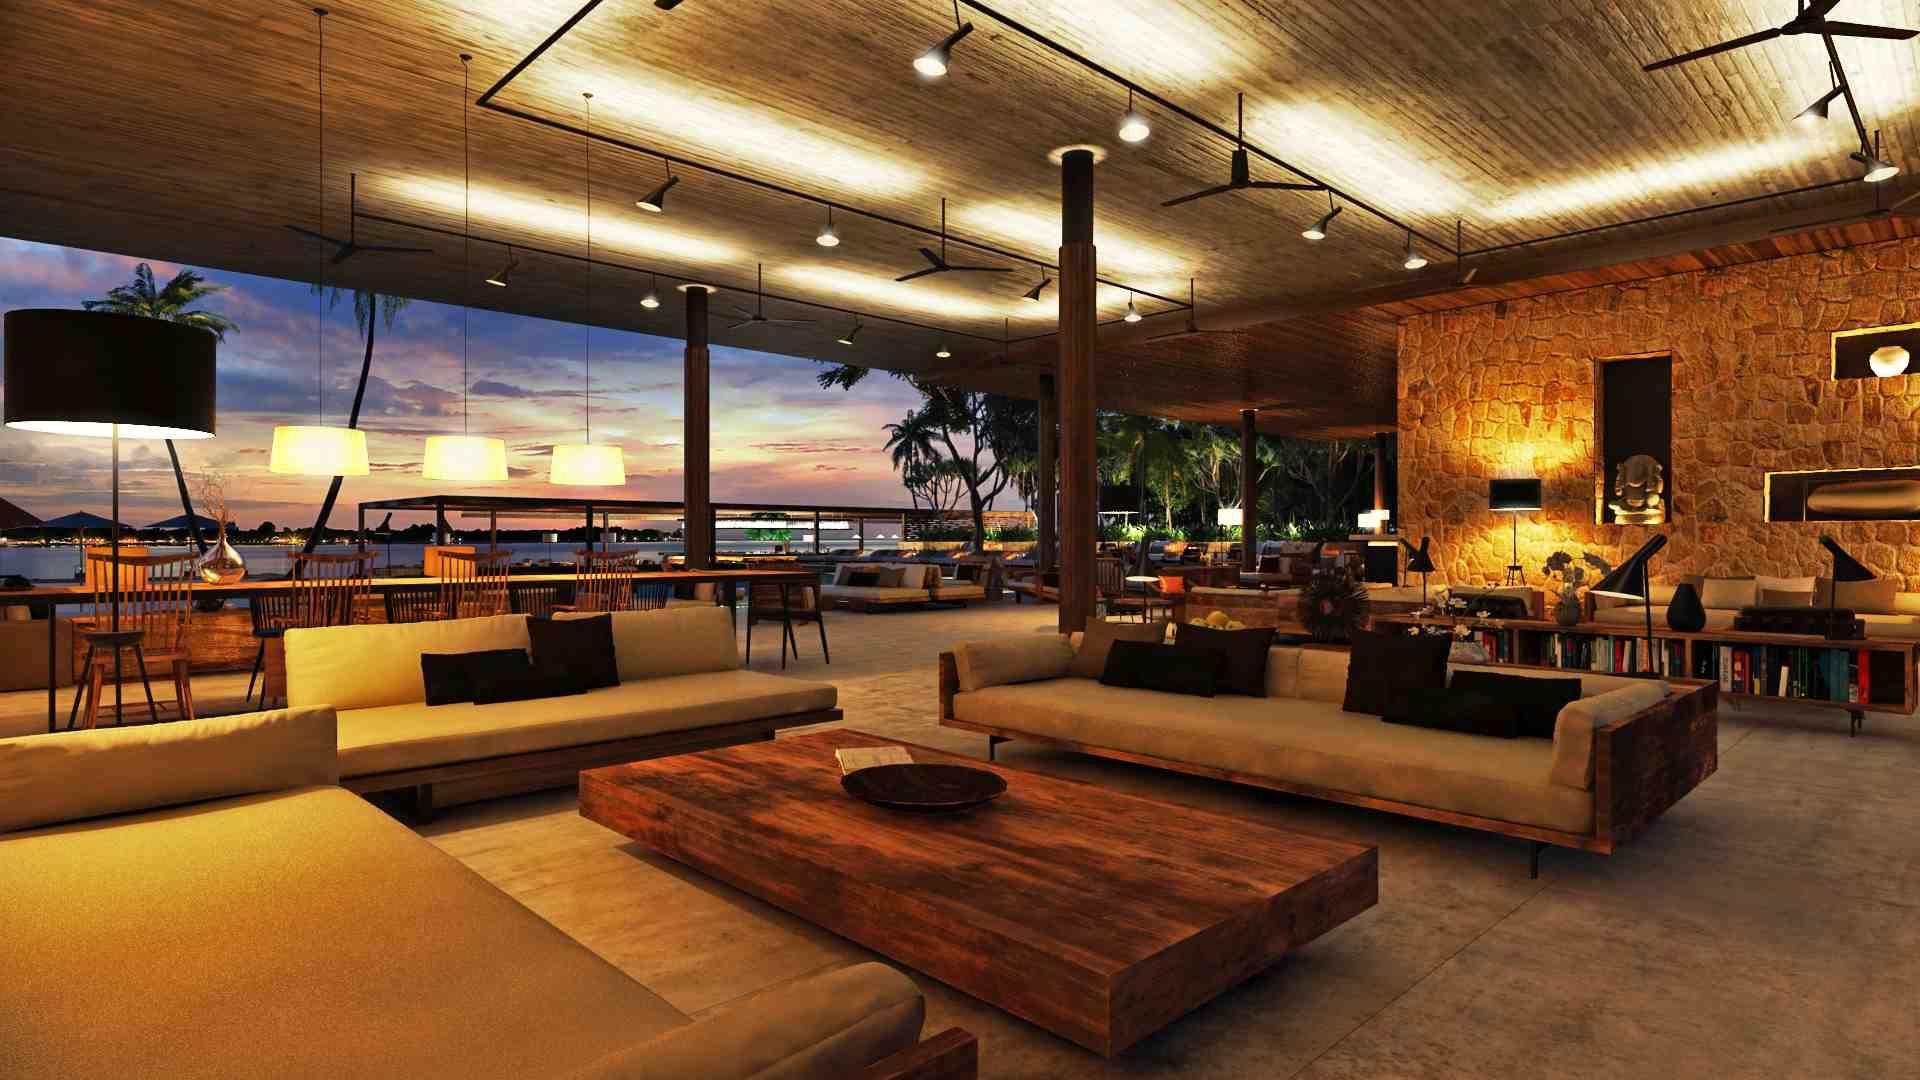 bali club house - Buscar con Google | lounge living room | Pinterest ...